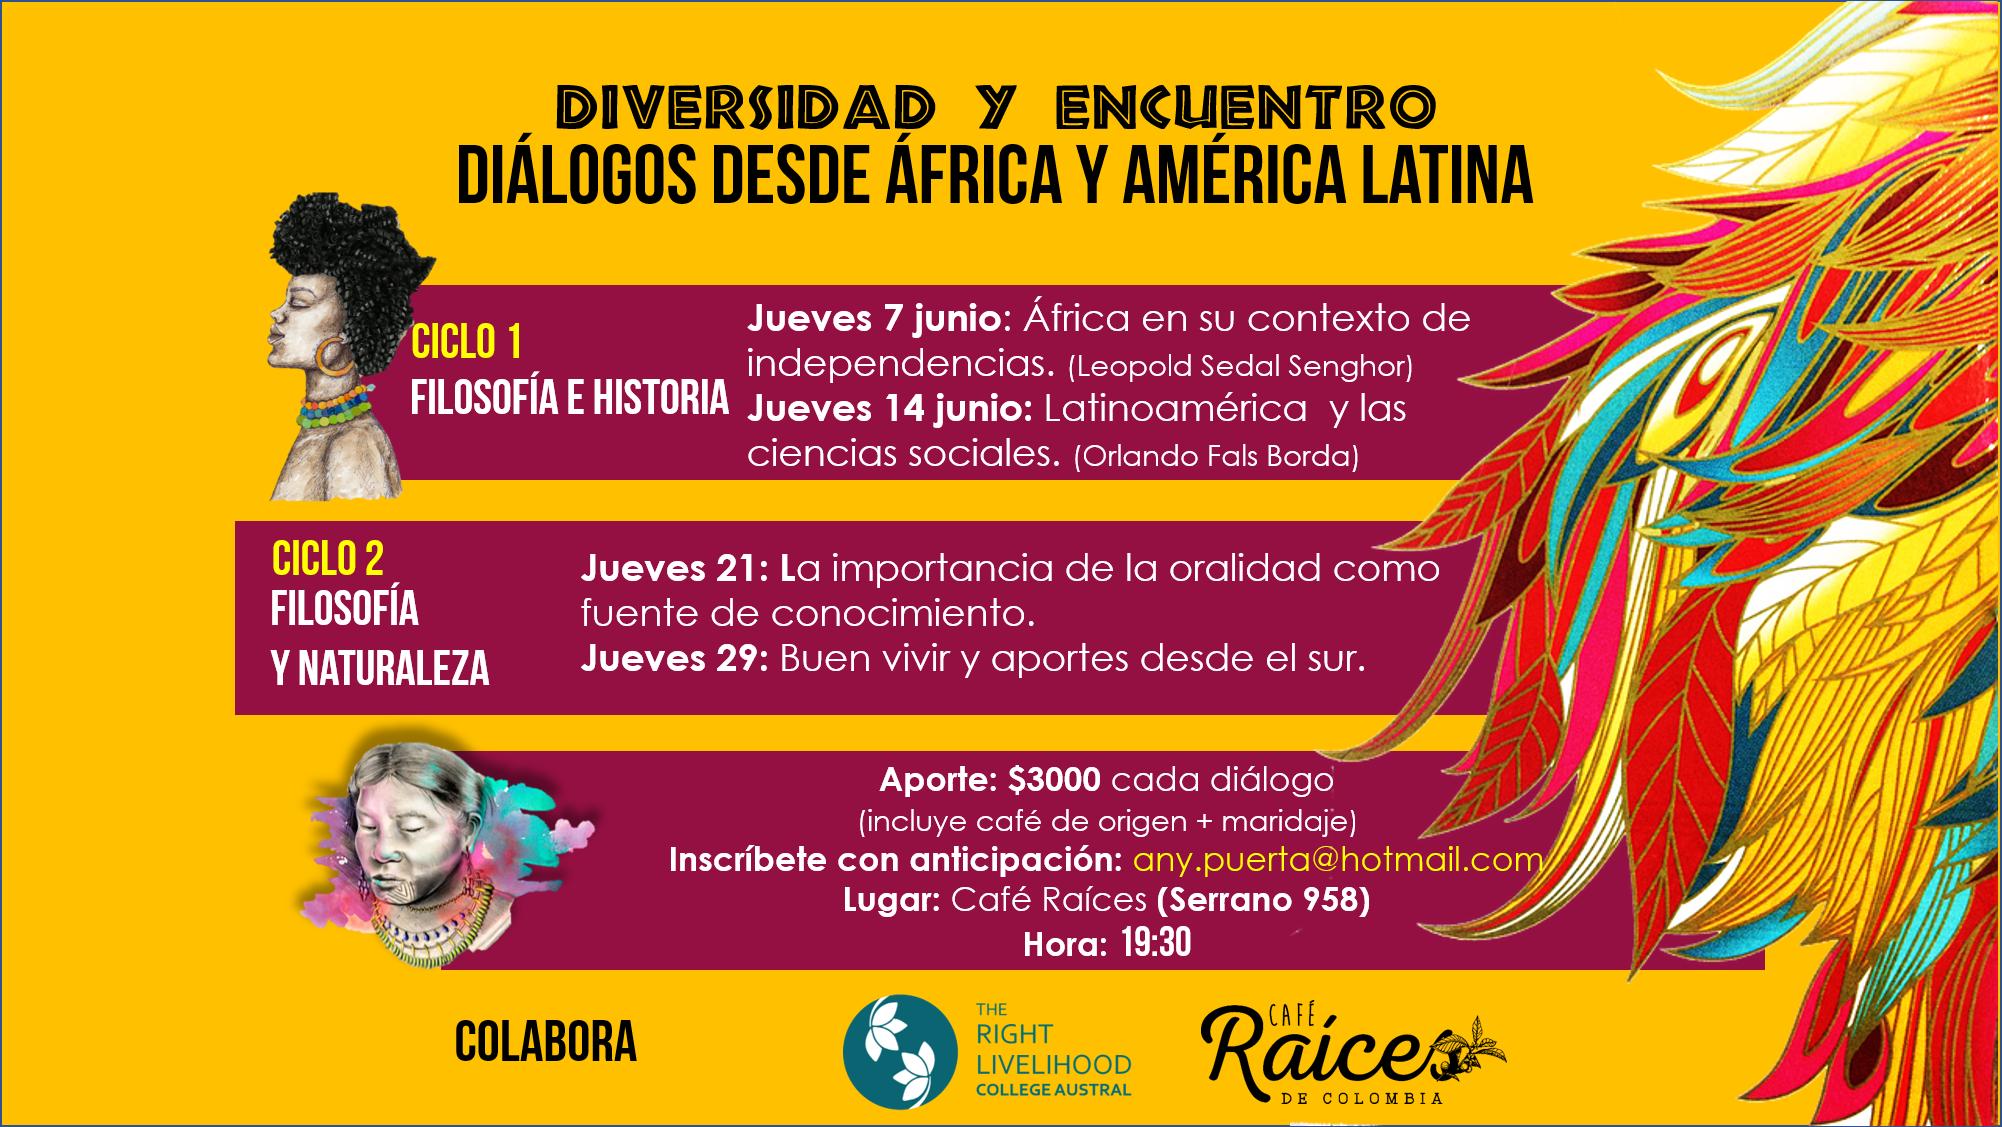 RLC Valdivia: Dialogue between Africa and Latin America